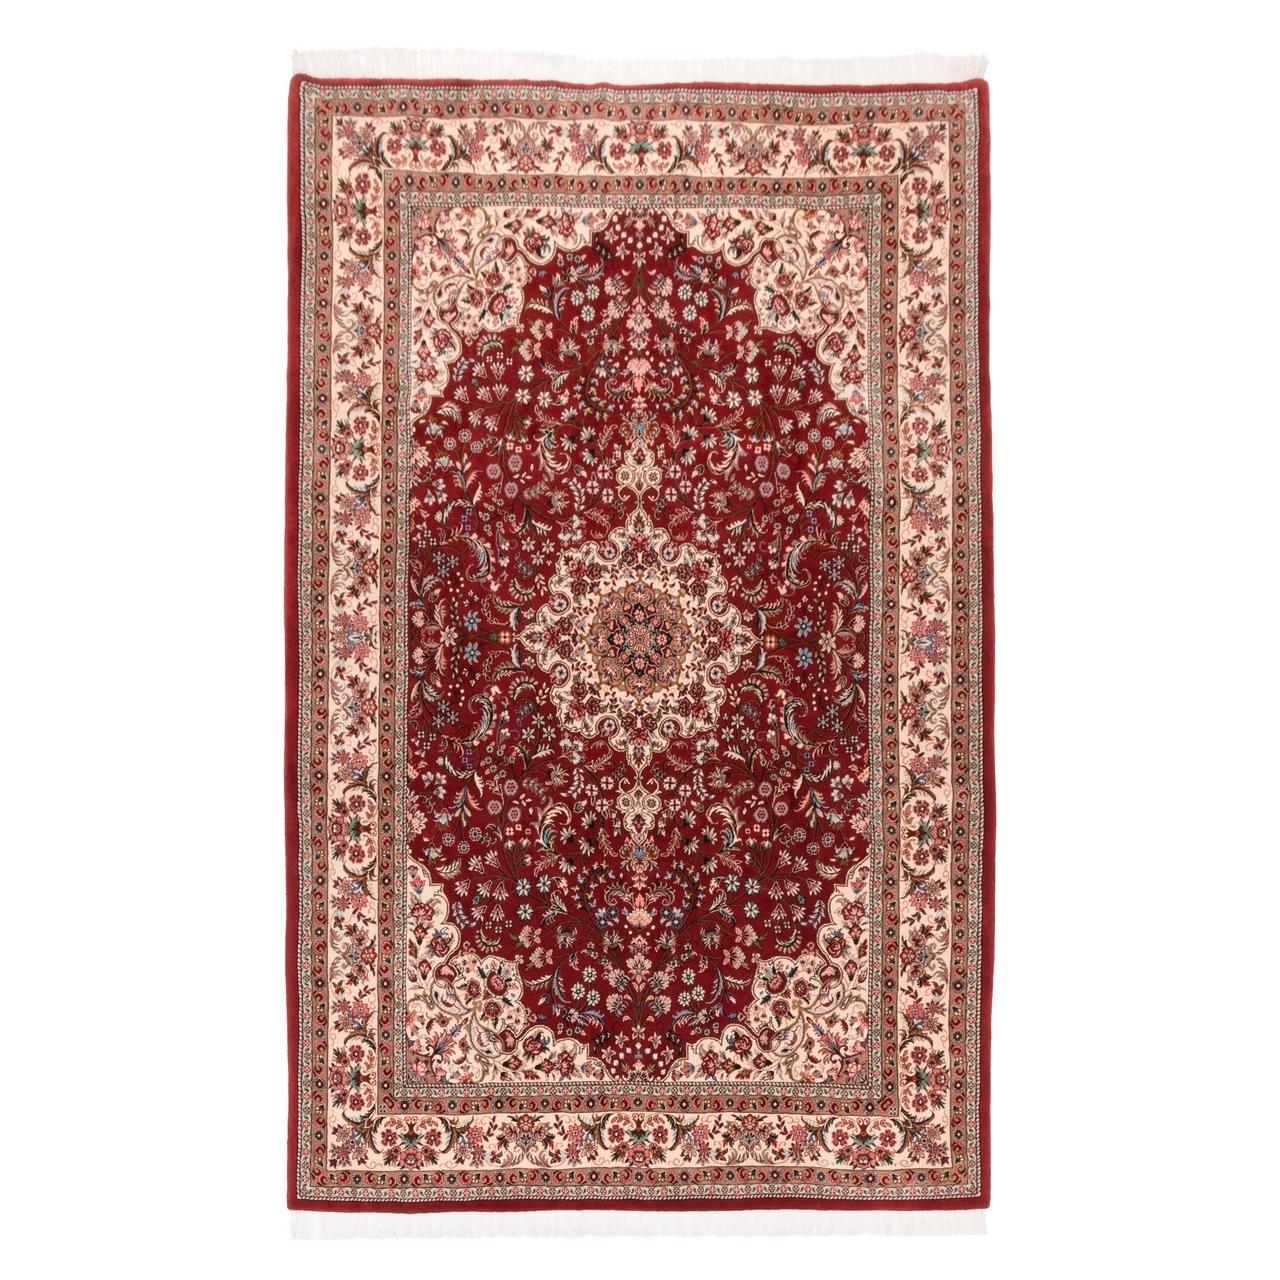 فرش دستباف شش متری سی پرشیا کد 174124